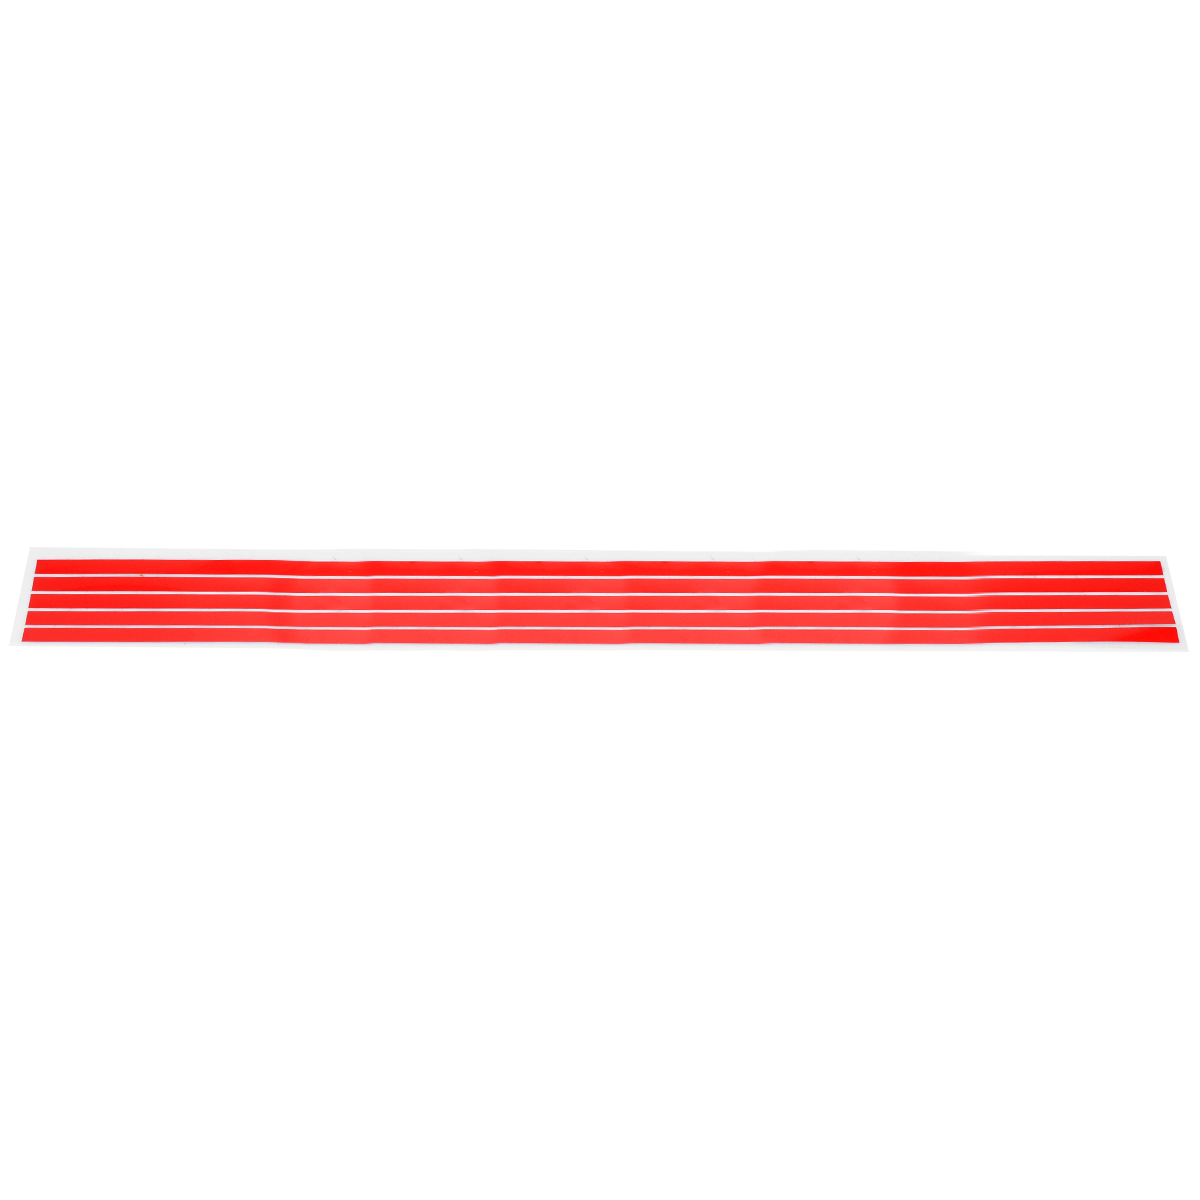 Купить с кэшбэком Mayitr New Red Front Hood Grill Grille Decal Car Sticker For V-W G-olf 6 7 T-iguan